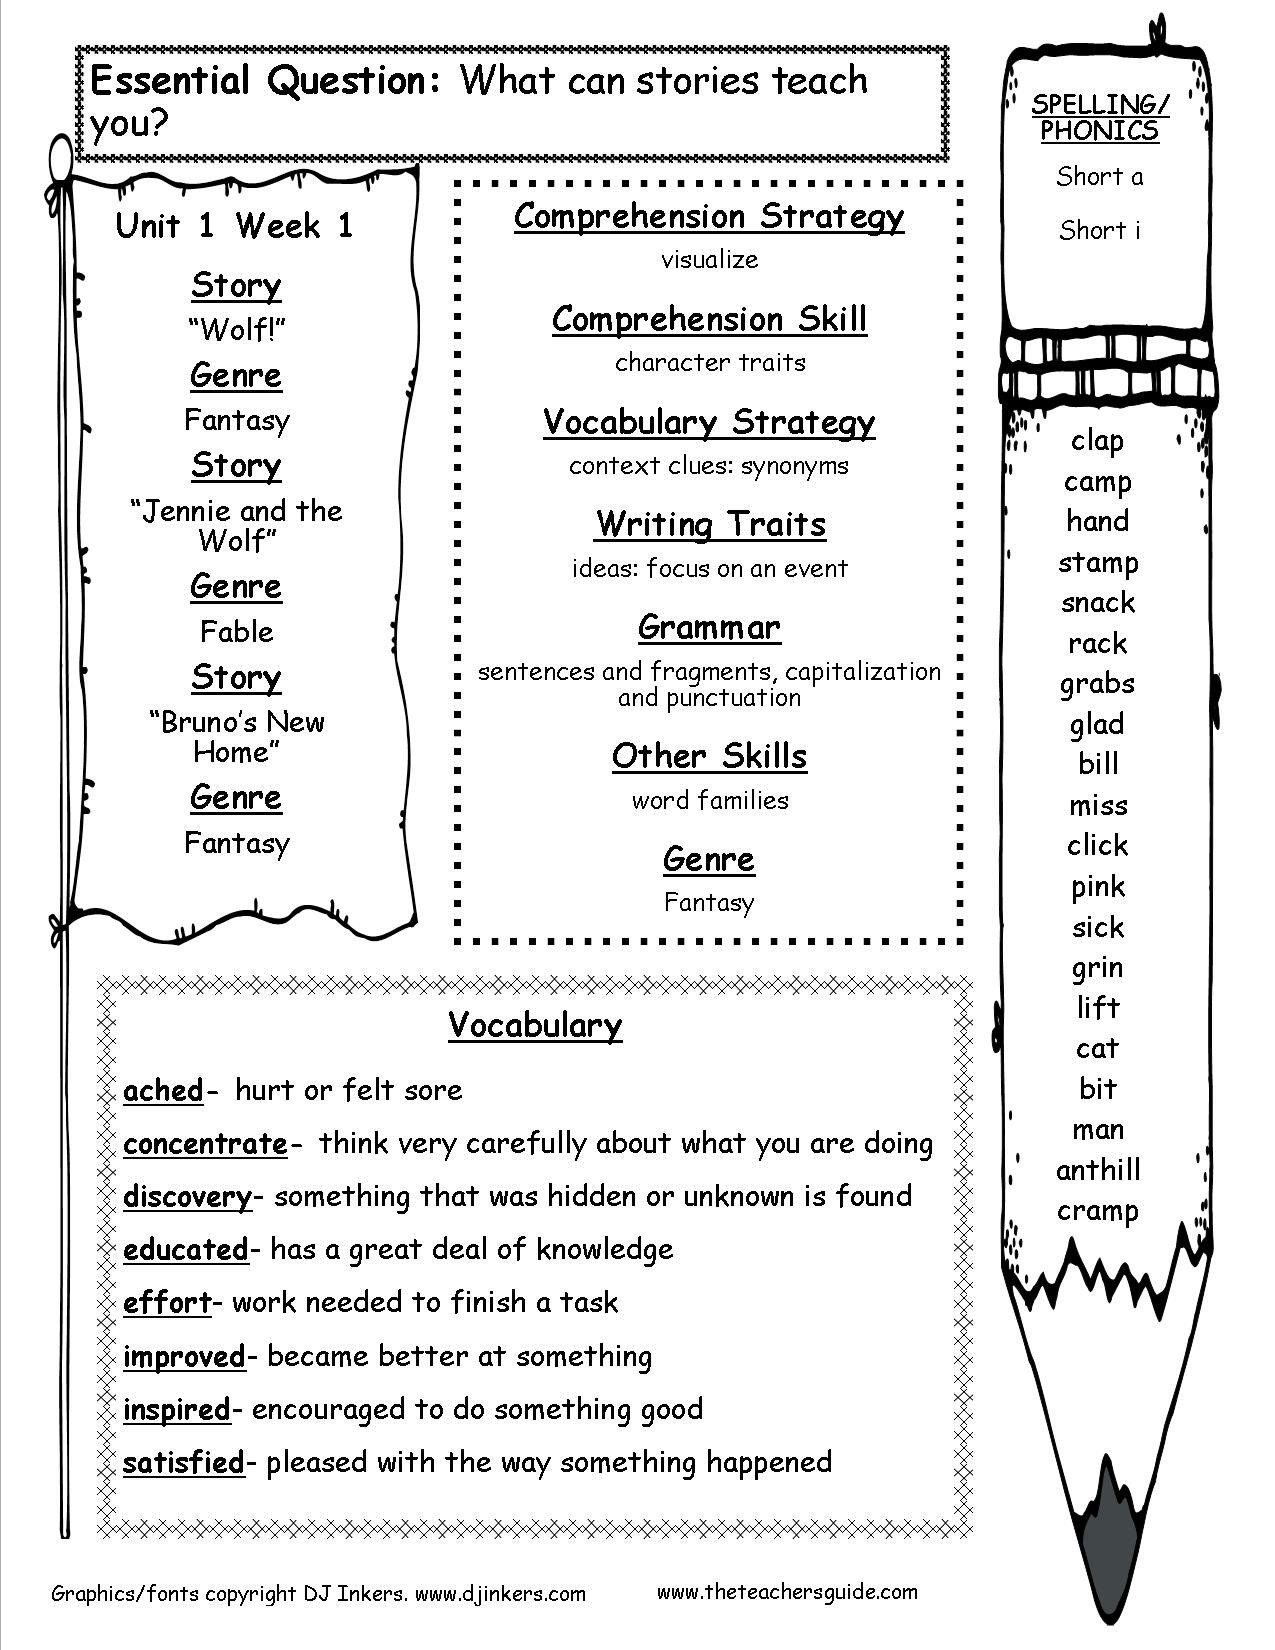 Free Printable Social Skills Worksheets Mcgraw Hill Wonders Third Grade In 2020 Third Grade Math Worksheets Reading Comprehension Worksheets Social Studies Worksheets